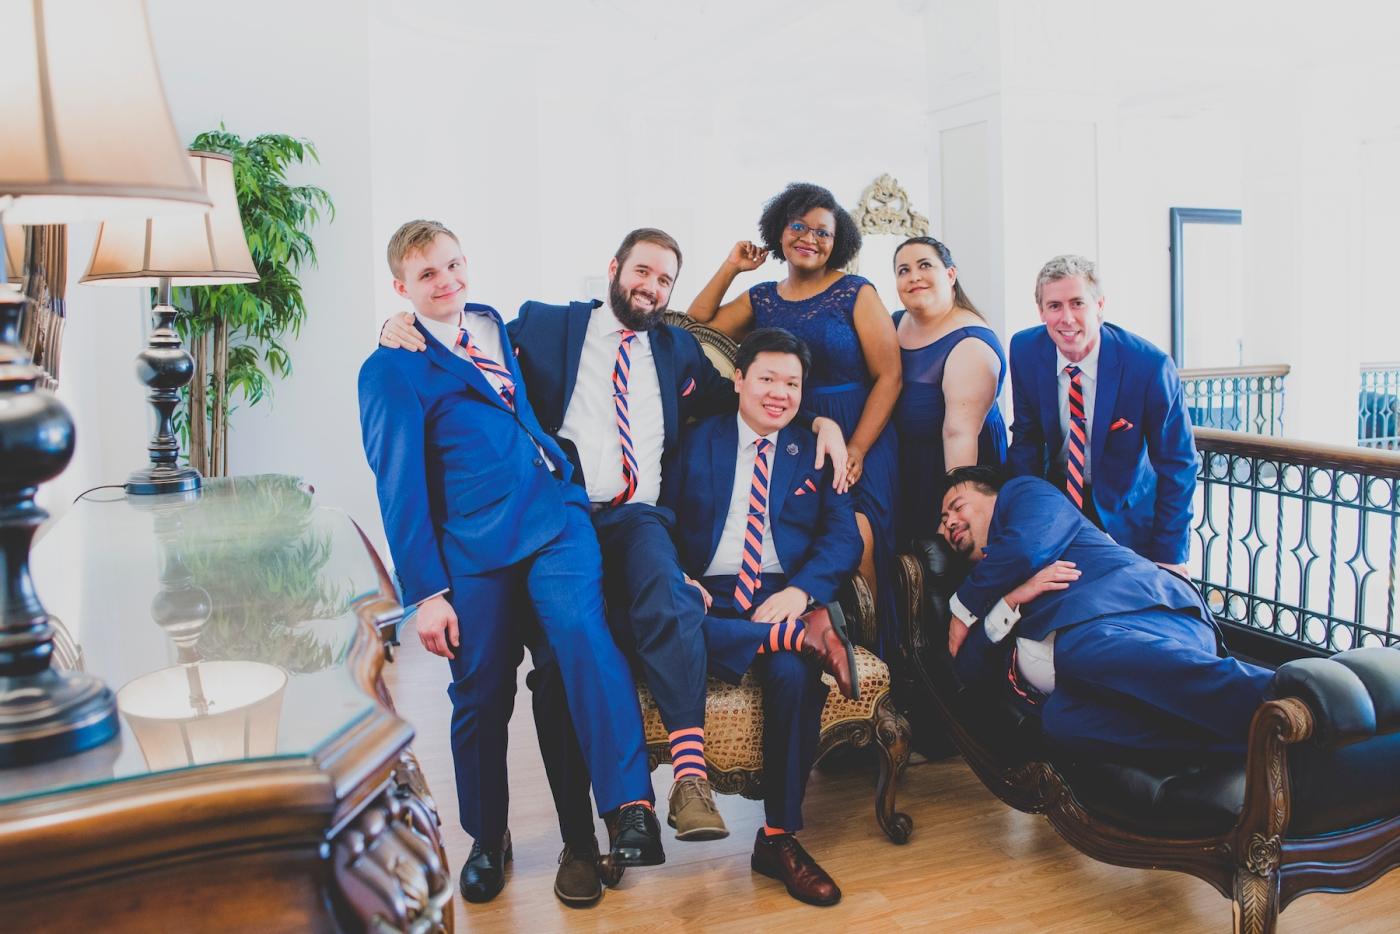 DSC_1978Everett_Wedding_Ballroom_Jane_Speleers_photography_Rachel_and_Edmund_Getting_ready_2017